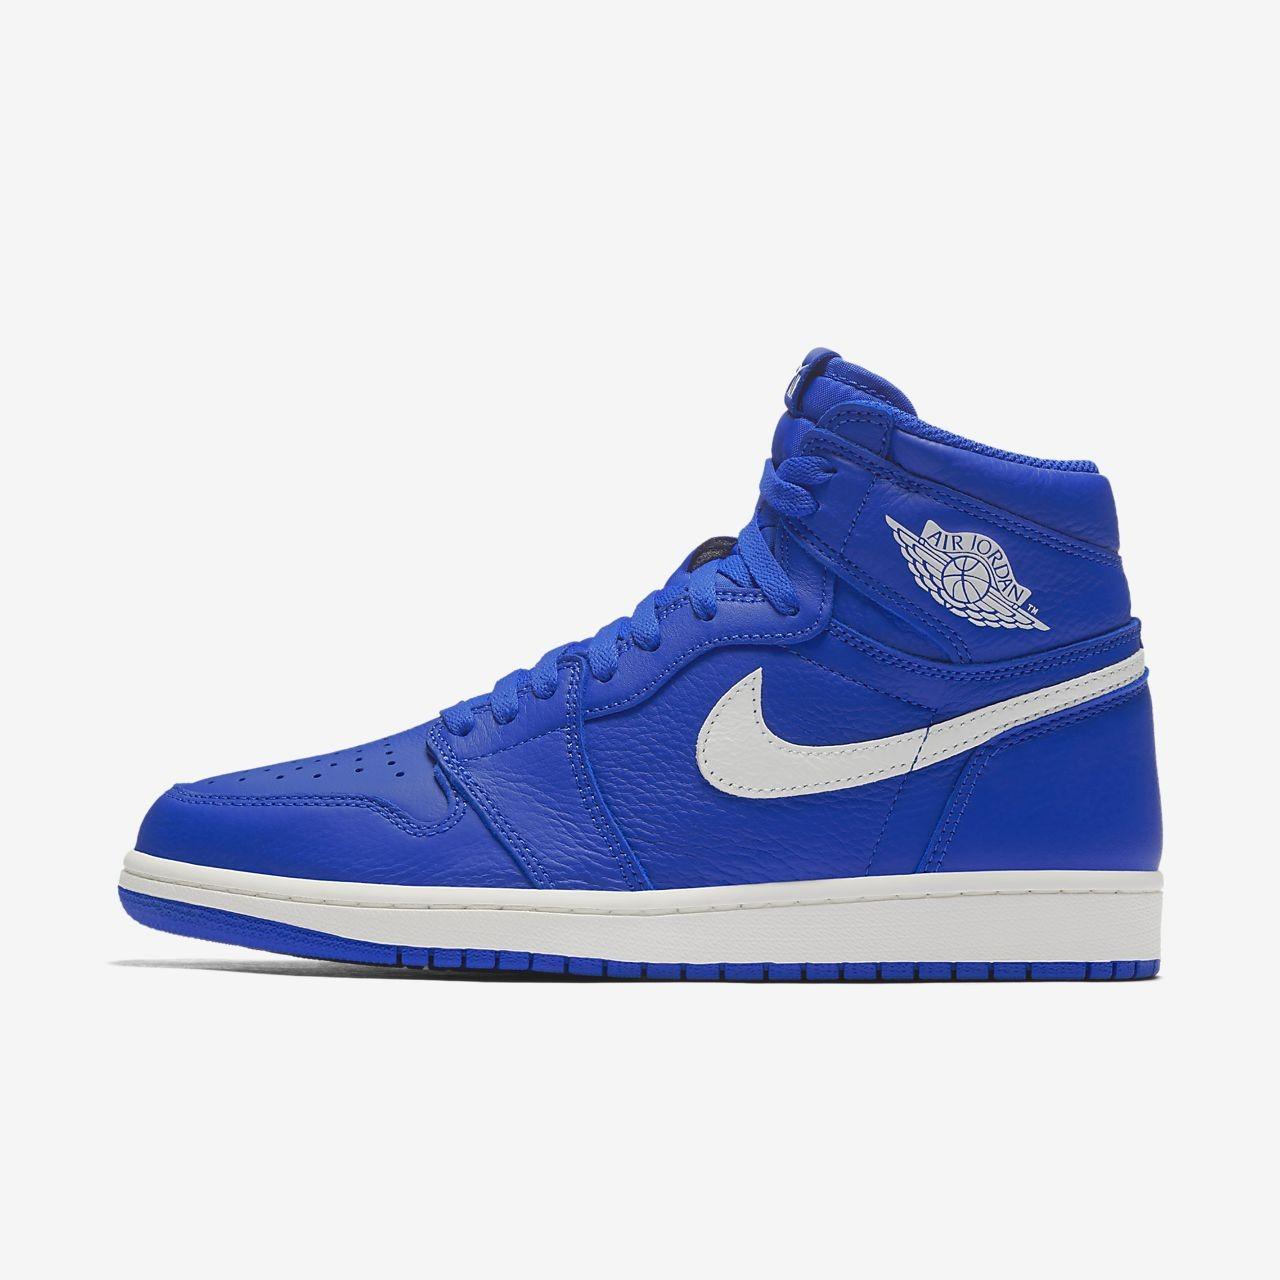 separation shoes a5449 57238 nike air jordan 1 retro